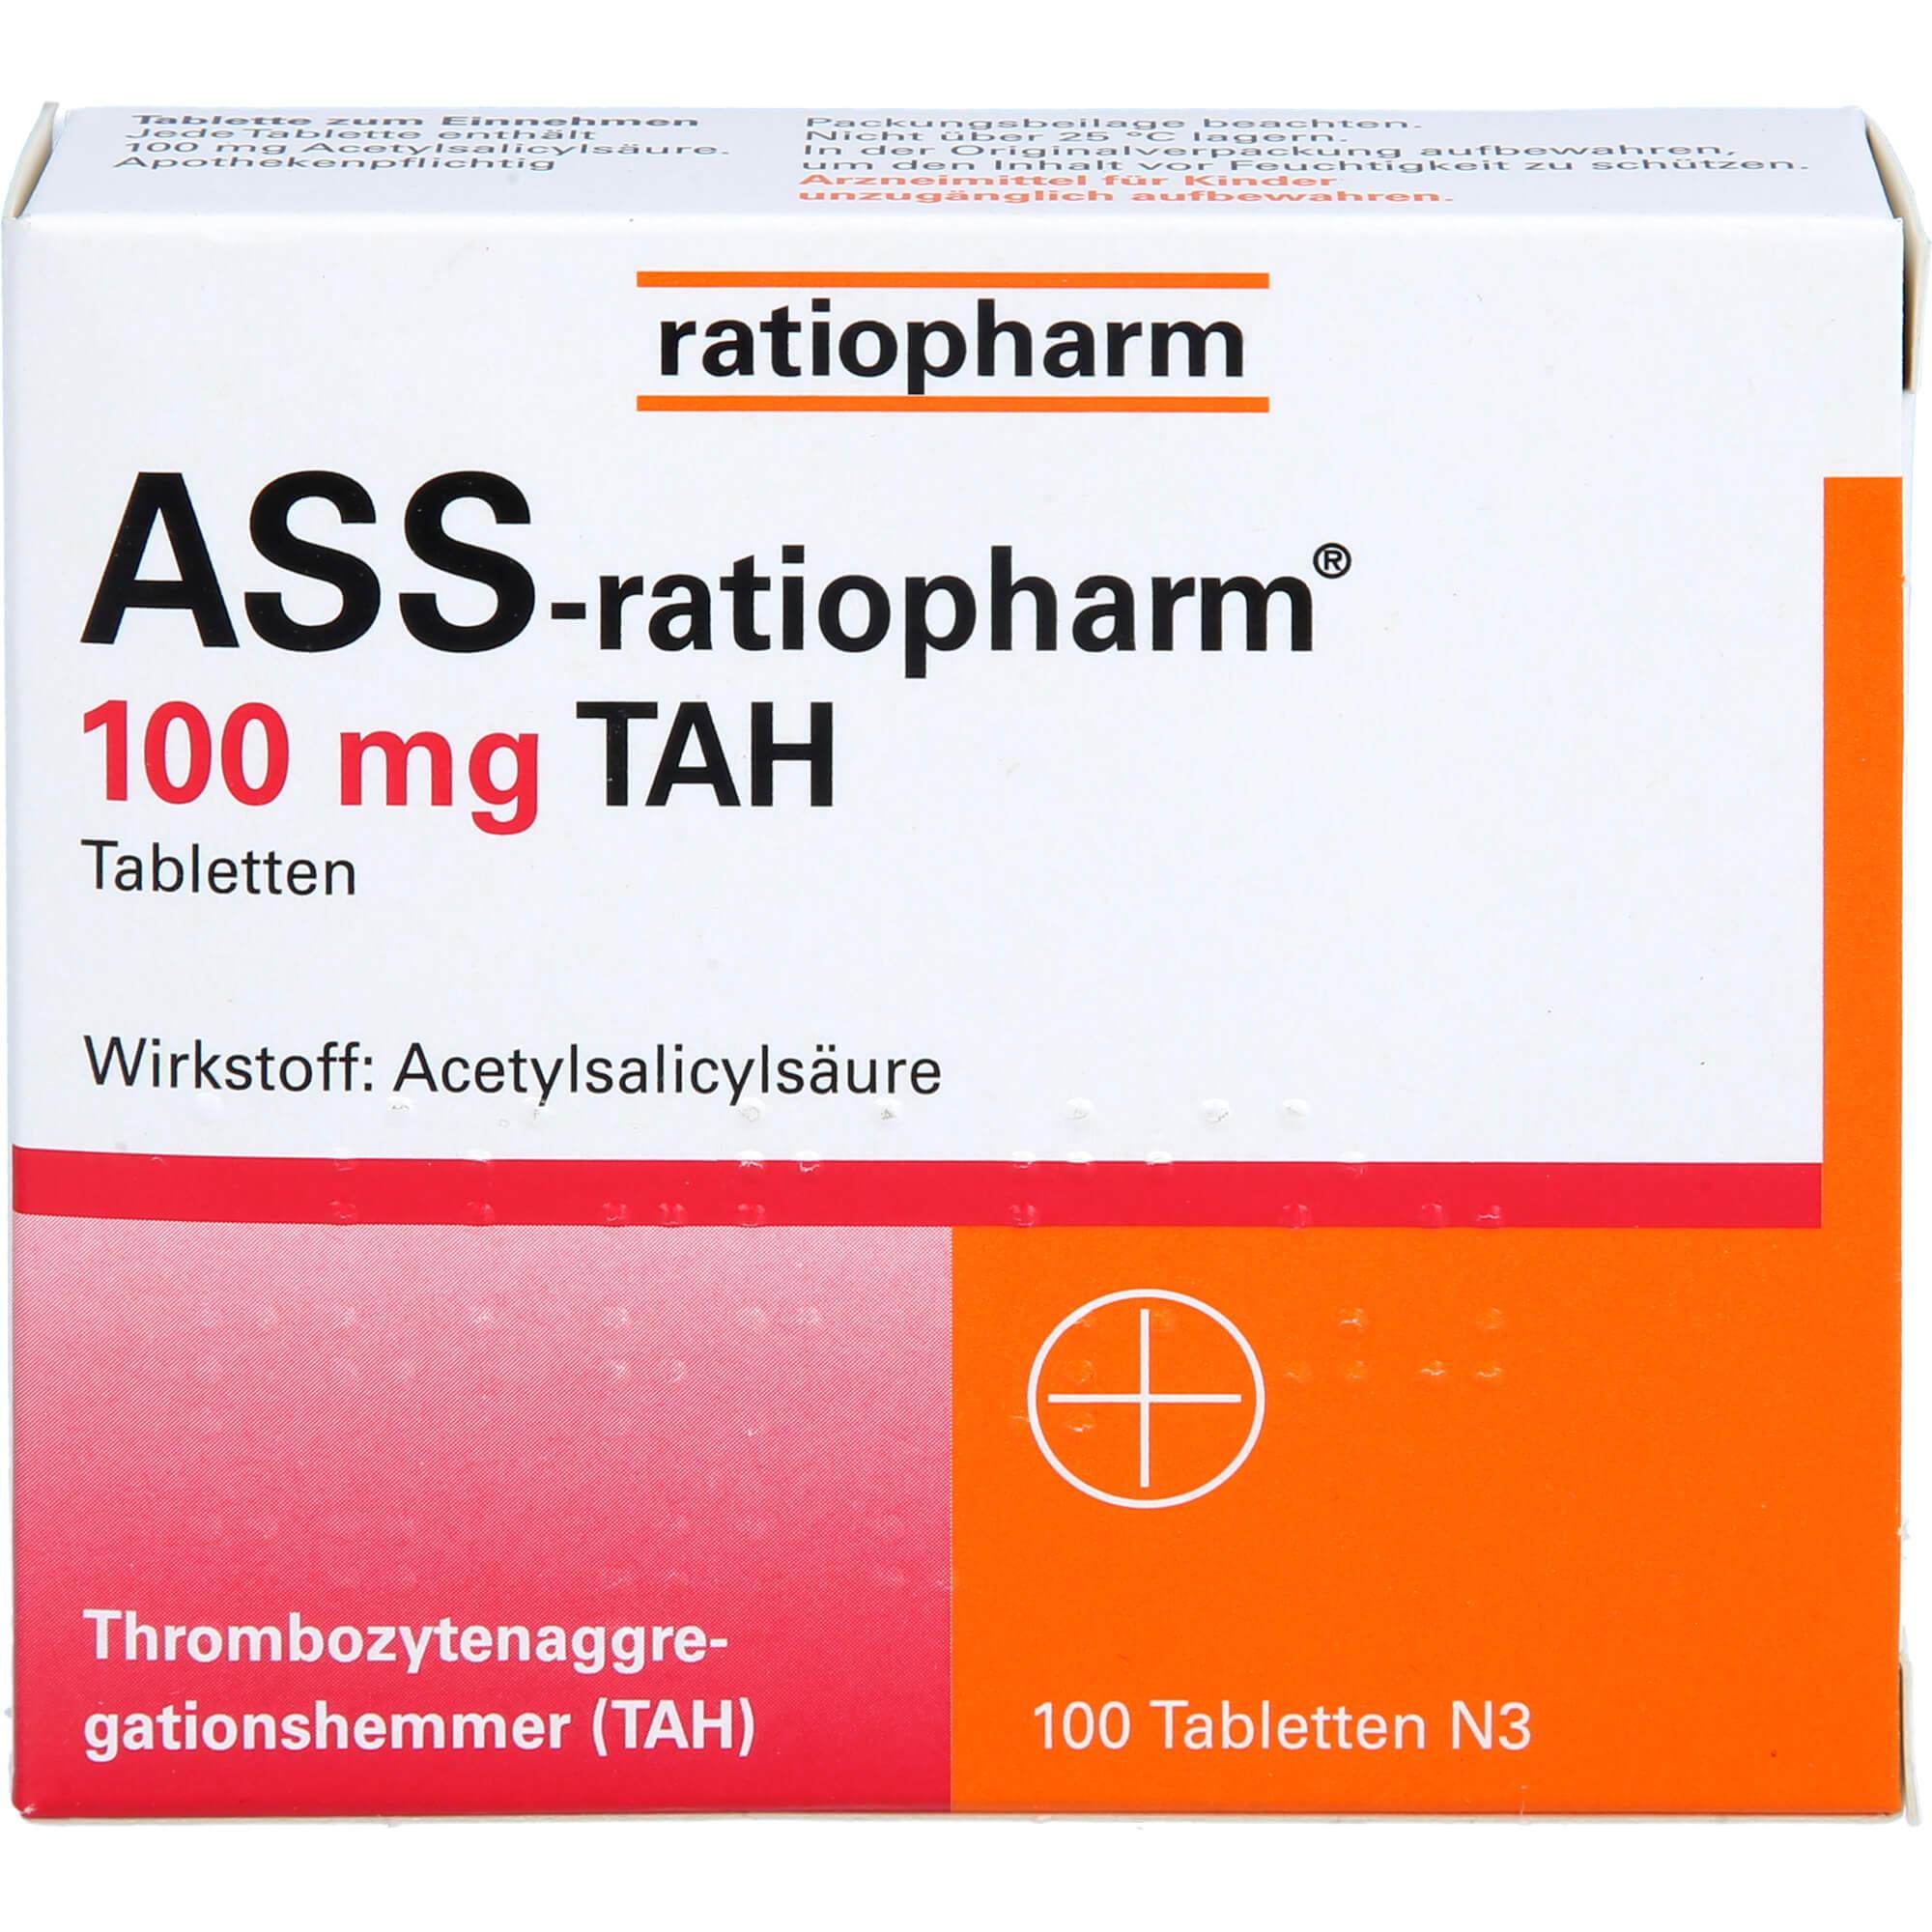 ASS-ratiopharm-100-mg-TAH-Tabletten